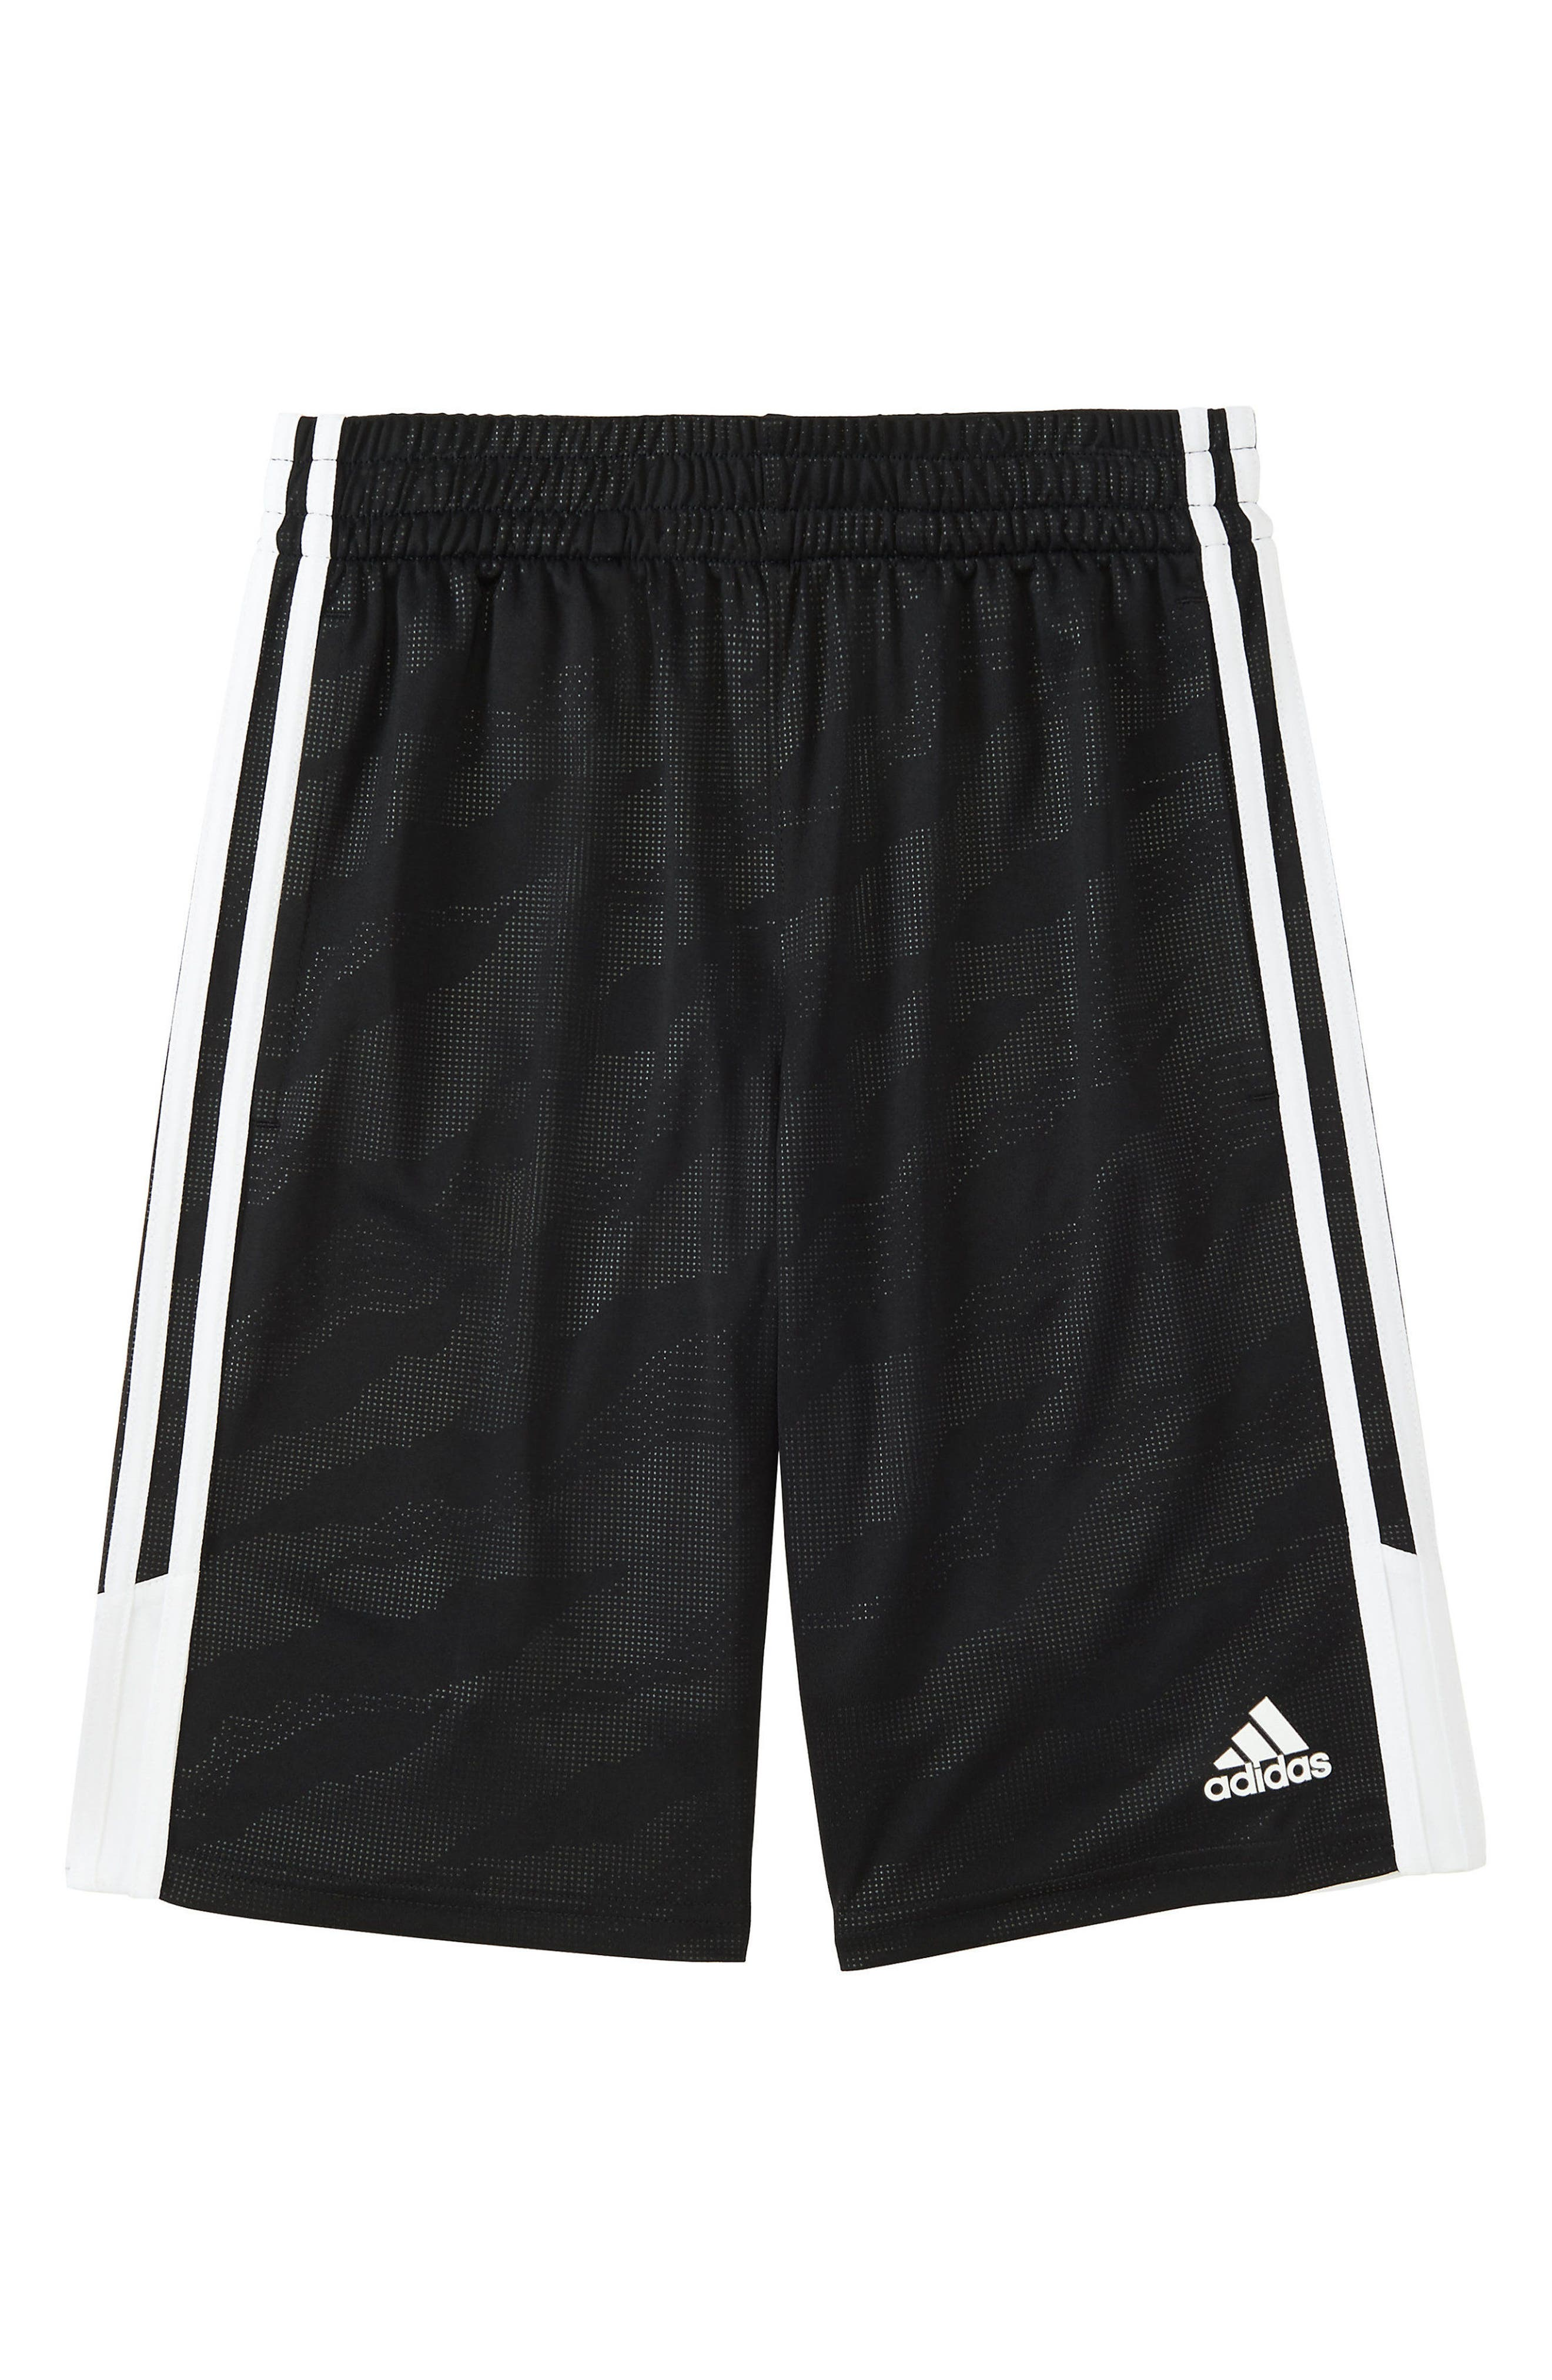 Camo Shorts,                             Main thumbnail 1, color,                             BLACK